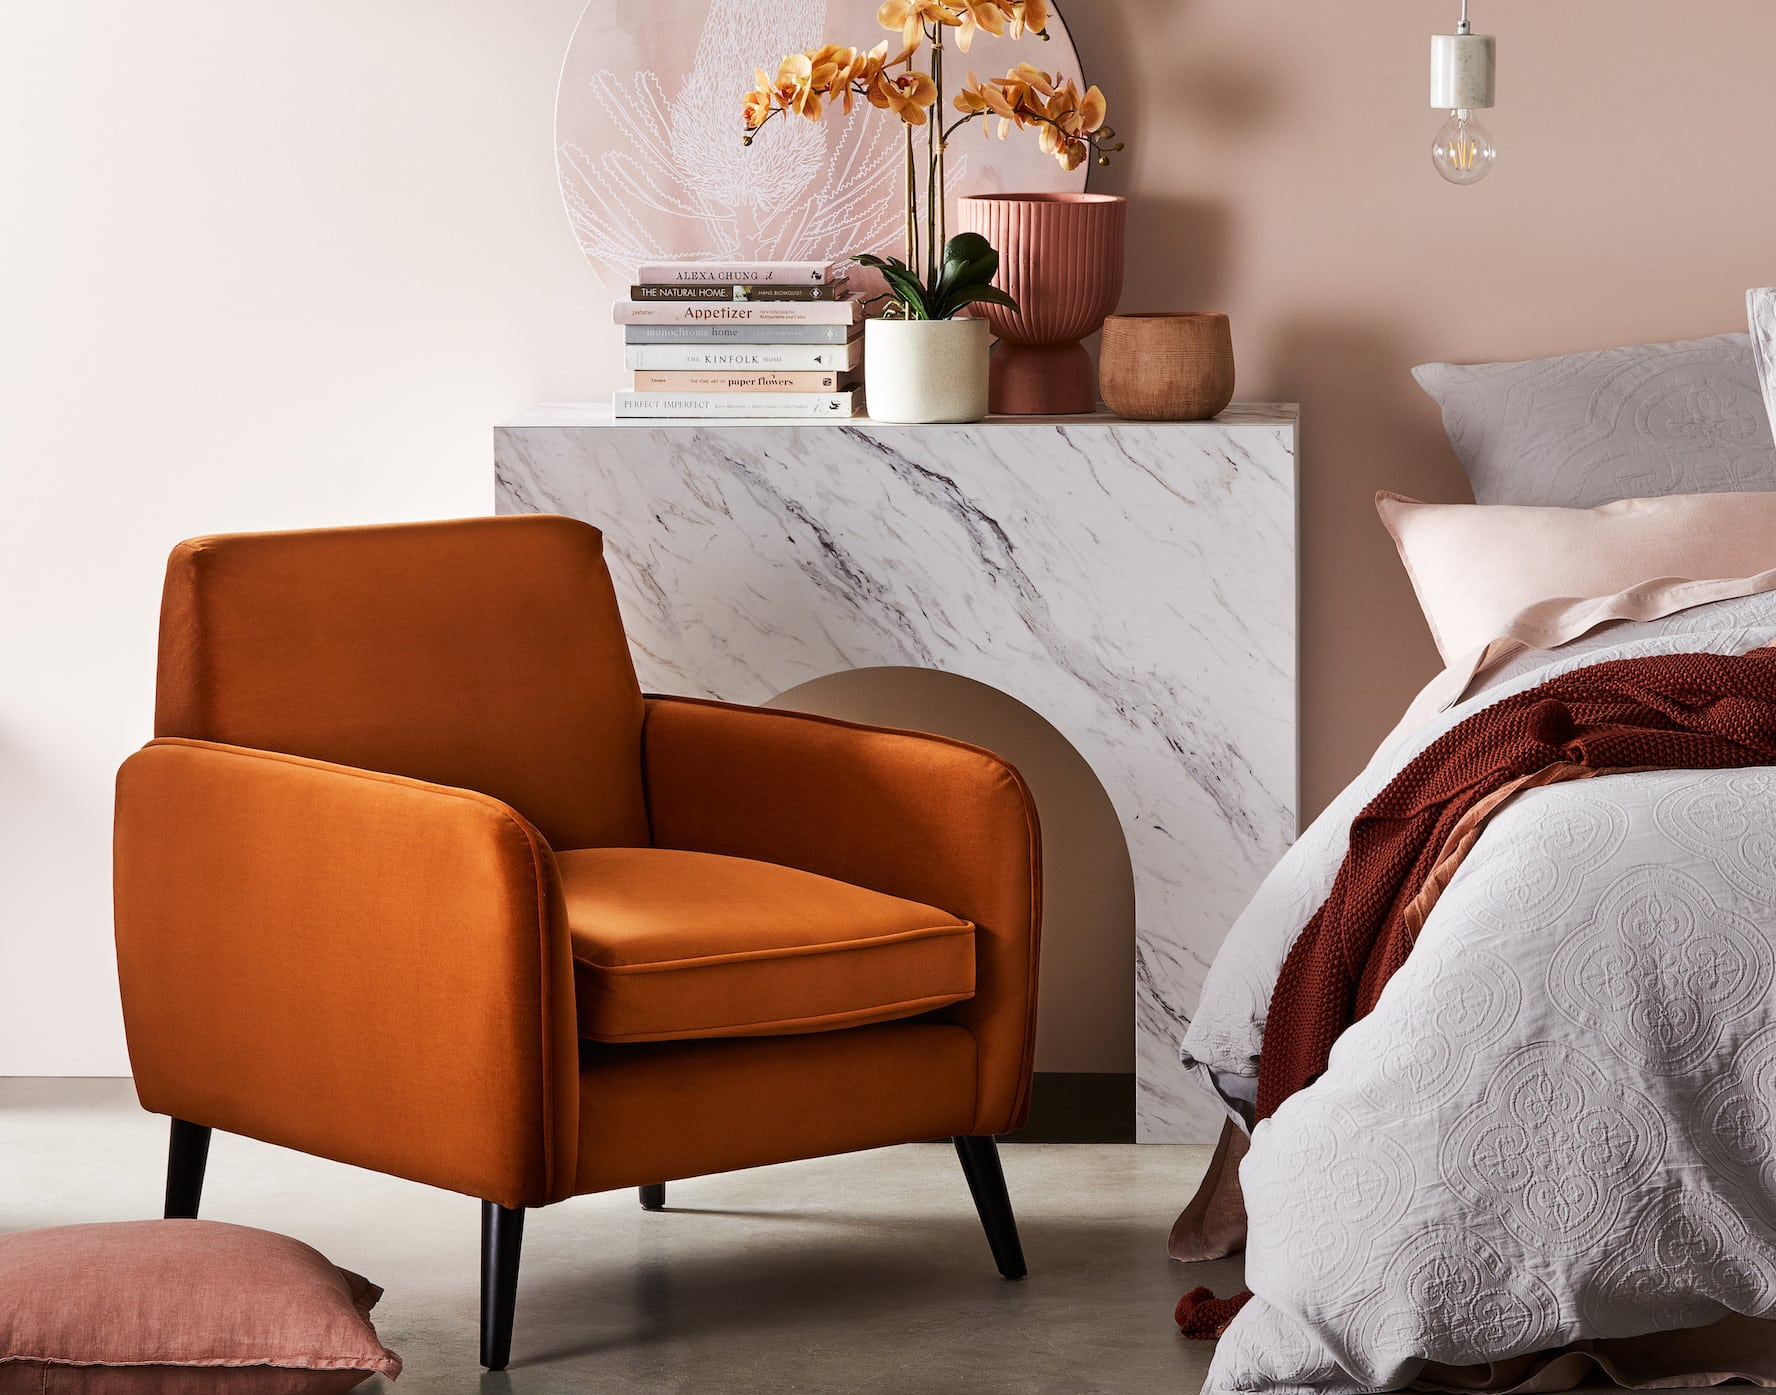 adairs portland armchair burnet orange velvet armchair in pink bedroom